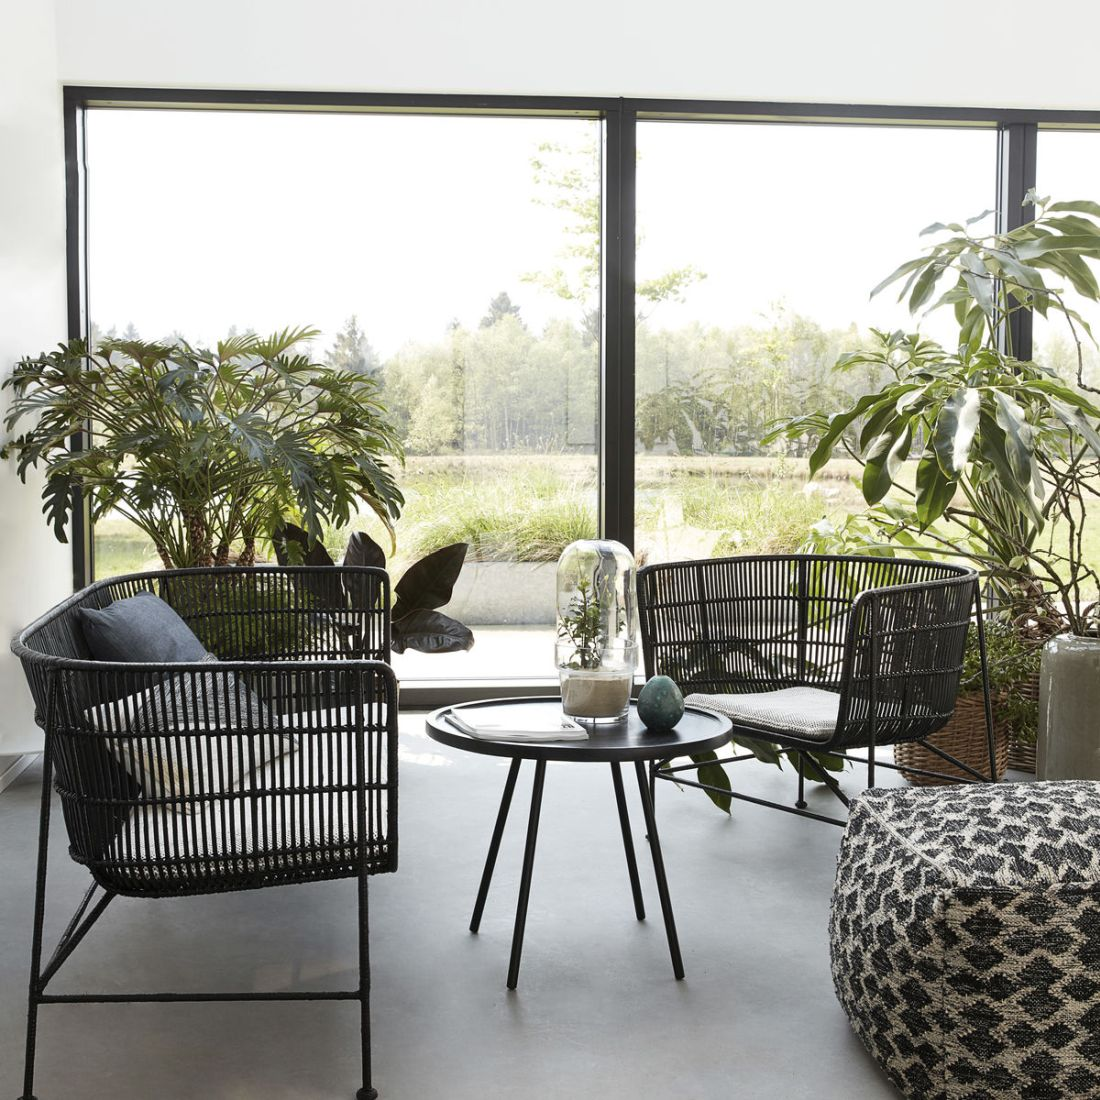 5alexander-a-pesrl_fiji-black-rattan-seating-collection.jpg